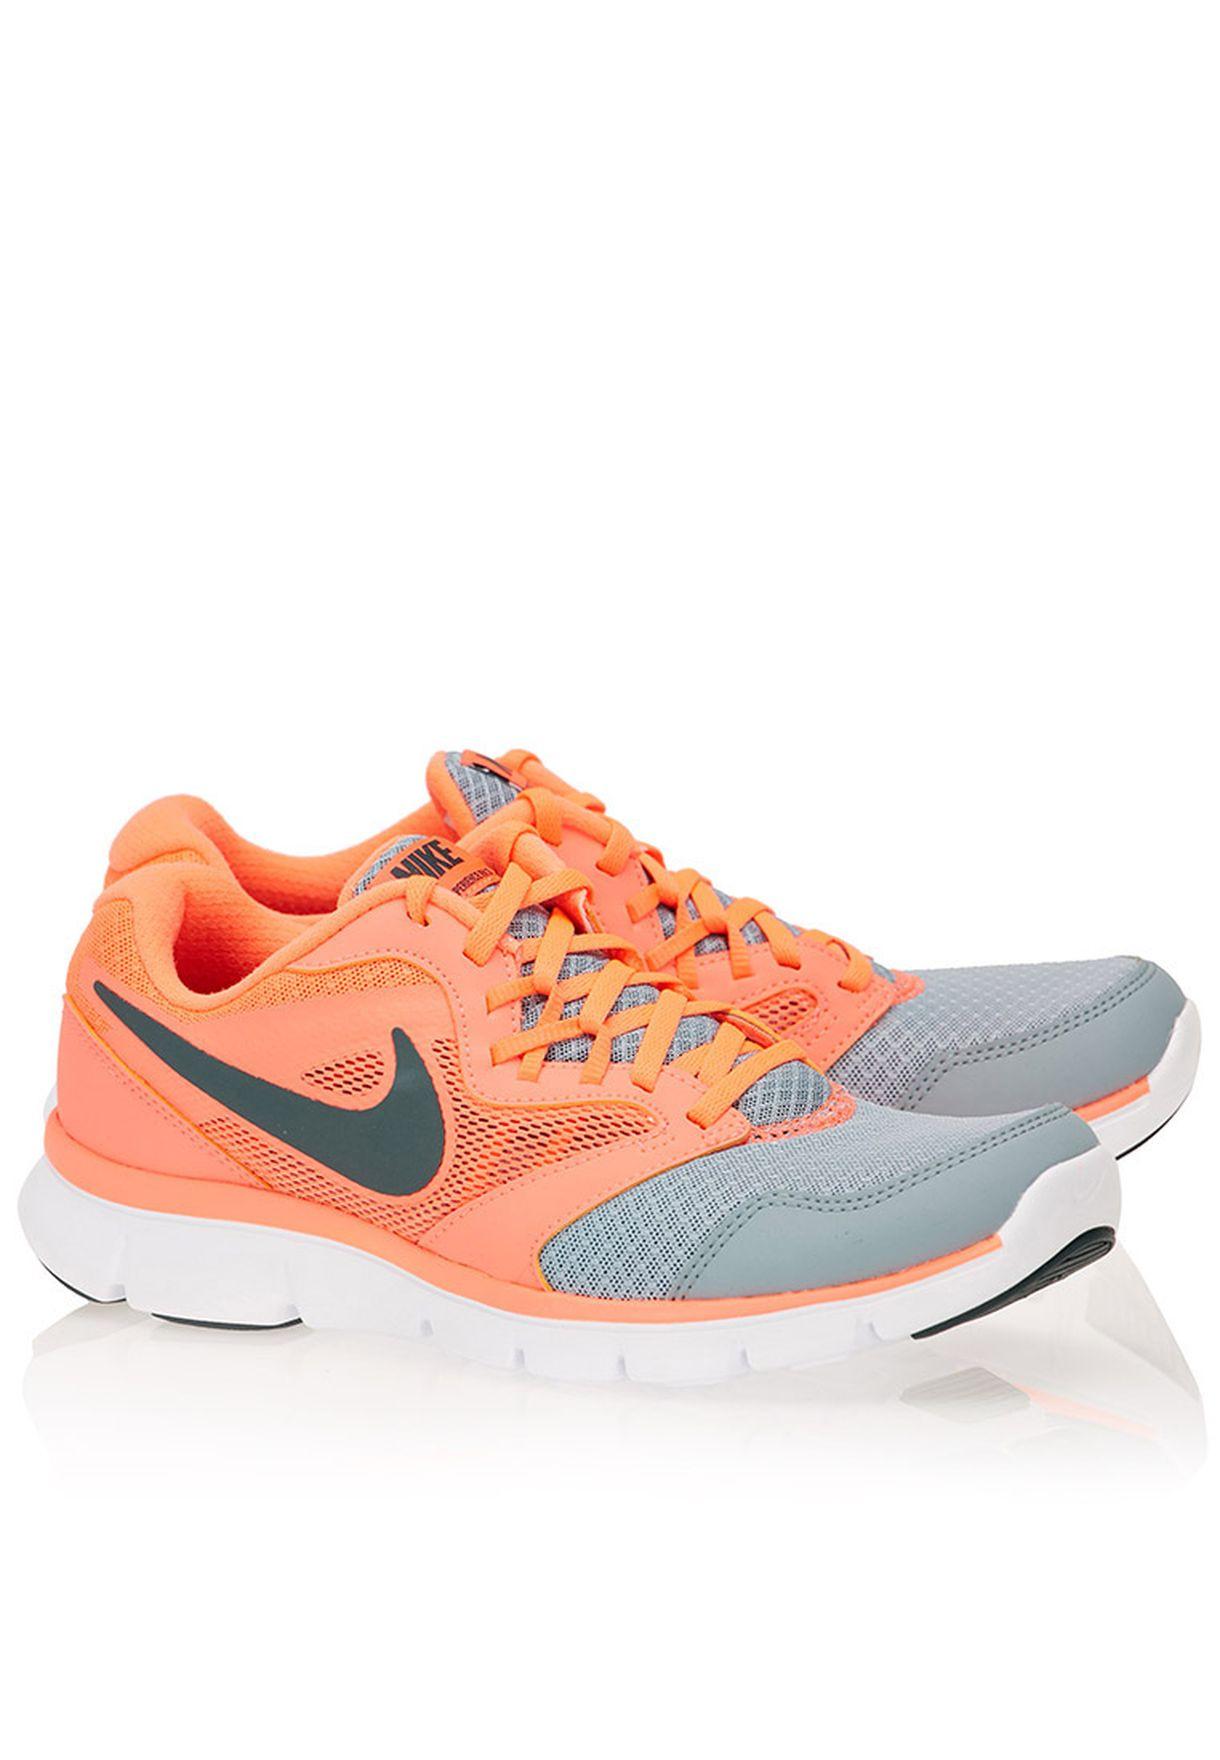 reputable site f6e86 6723a Shop Nike multicolor Flex Experience Run 3 MSL 652858-017 for Women ...